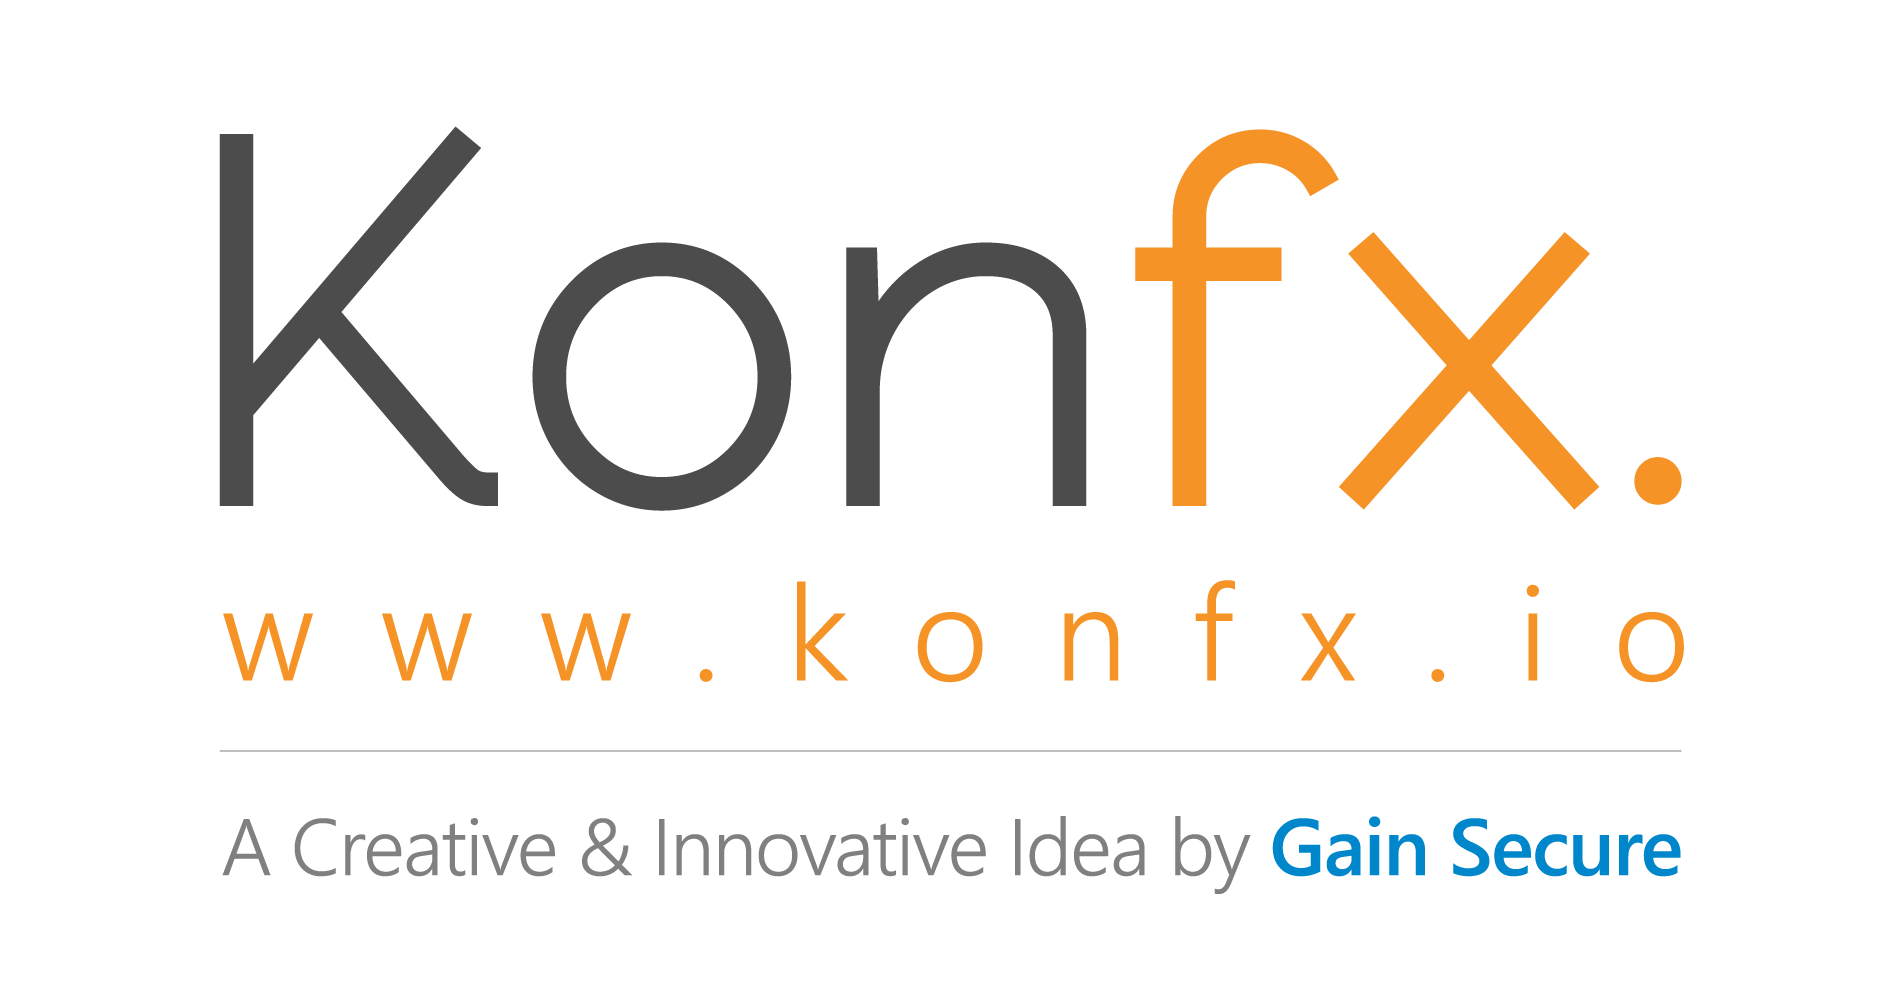 Knofx